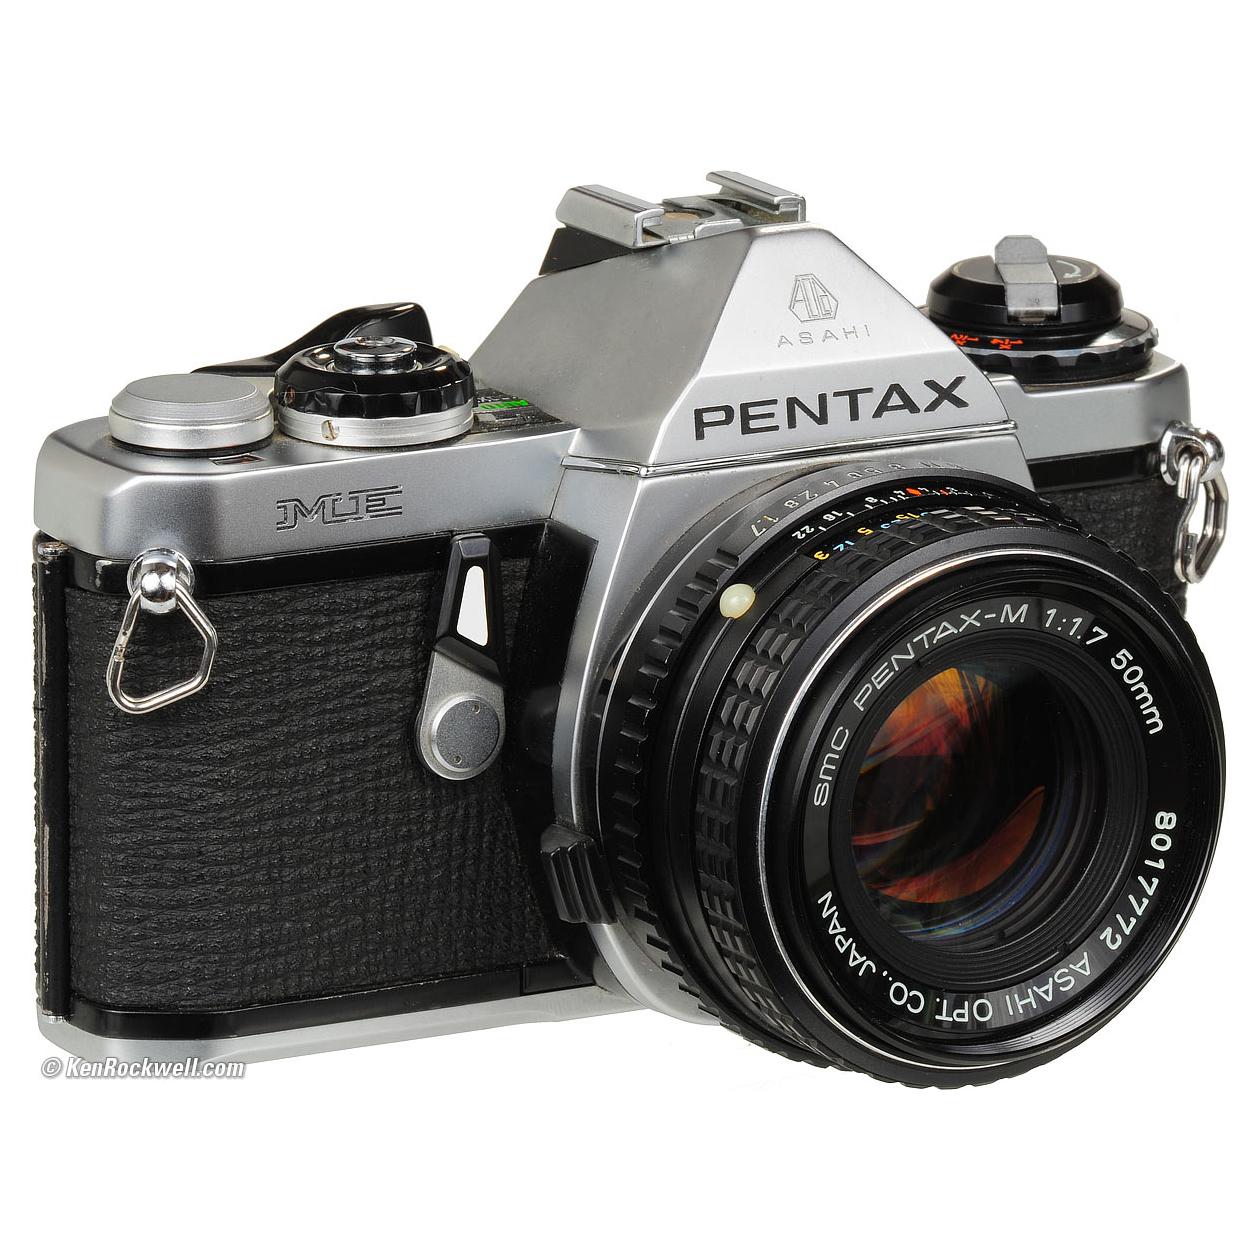 Pentax ME 35mm film camera